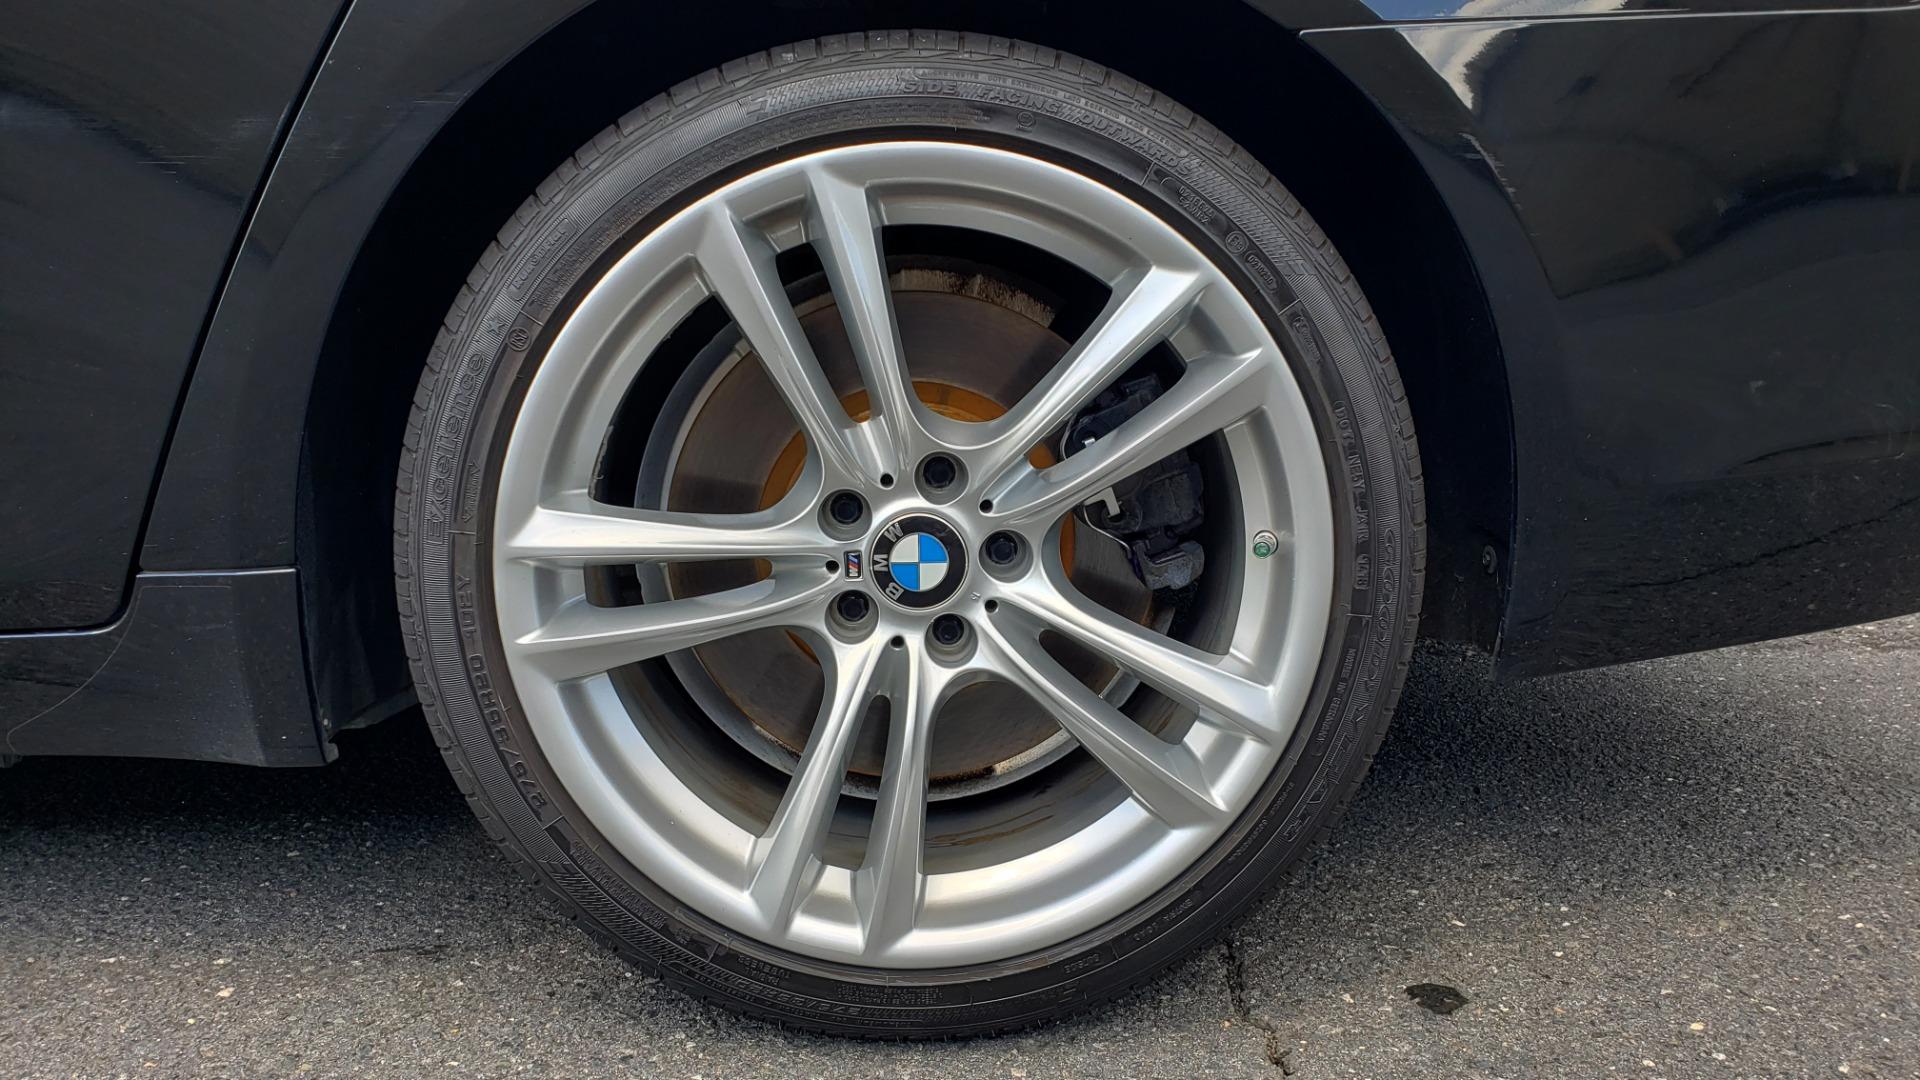 Used 2014 BMW 7 SERIES 750LI M-SPORT / EXEC PKG / DRVR ASST / LIGHTING / NAV / SUNROOF for sale Sold at Formula Imports in Charlotte NC 28227 79